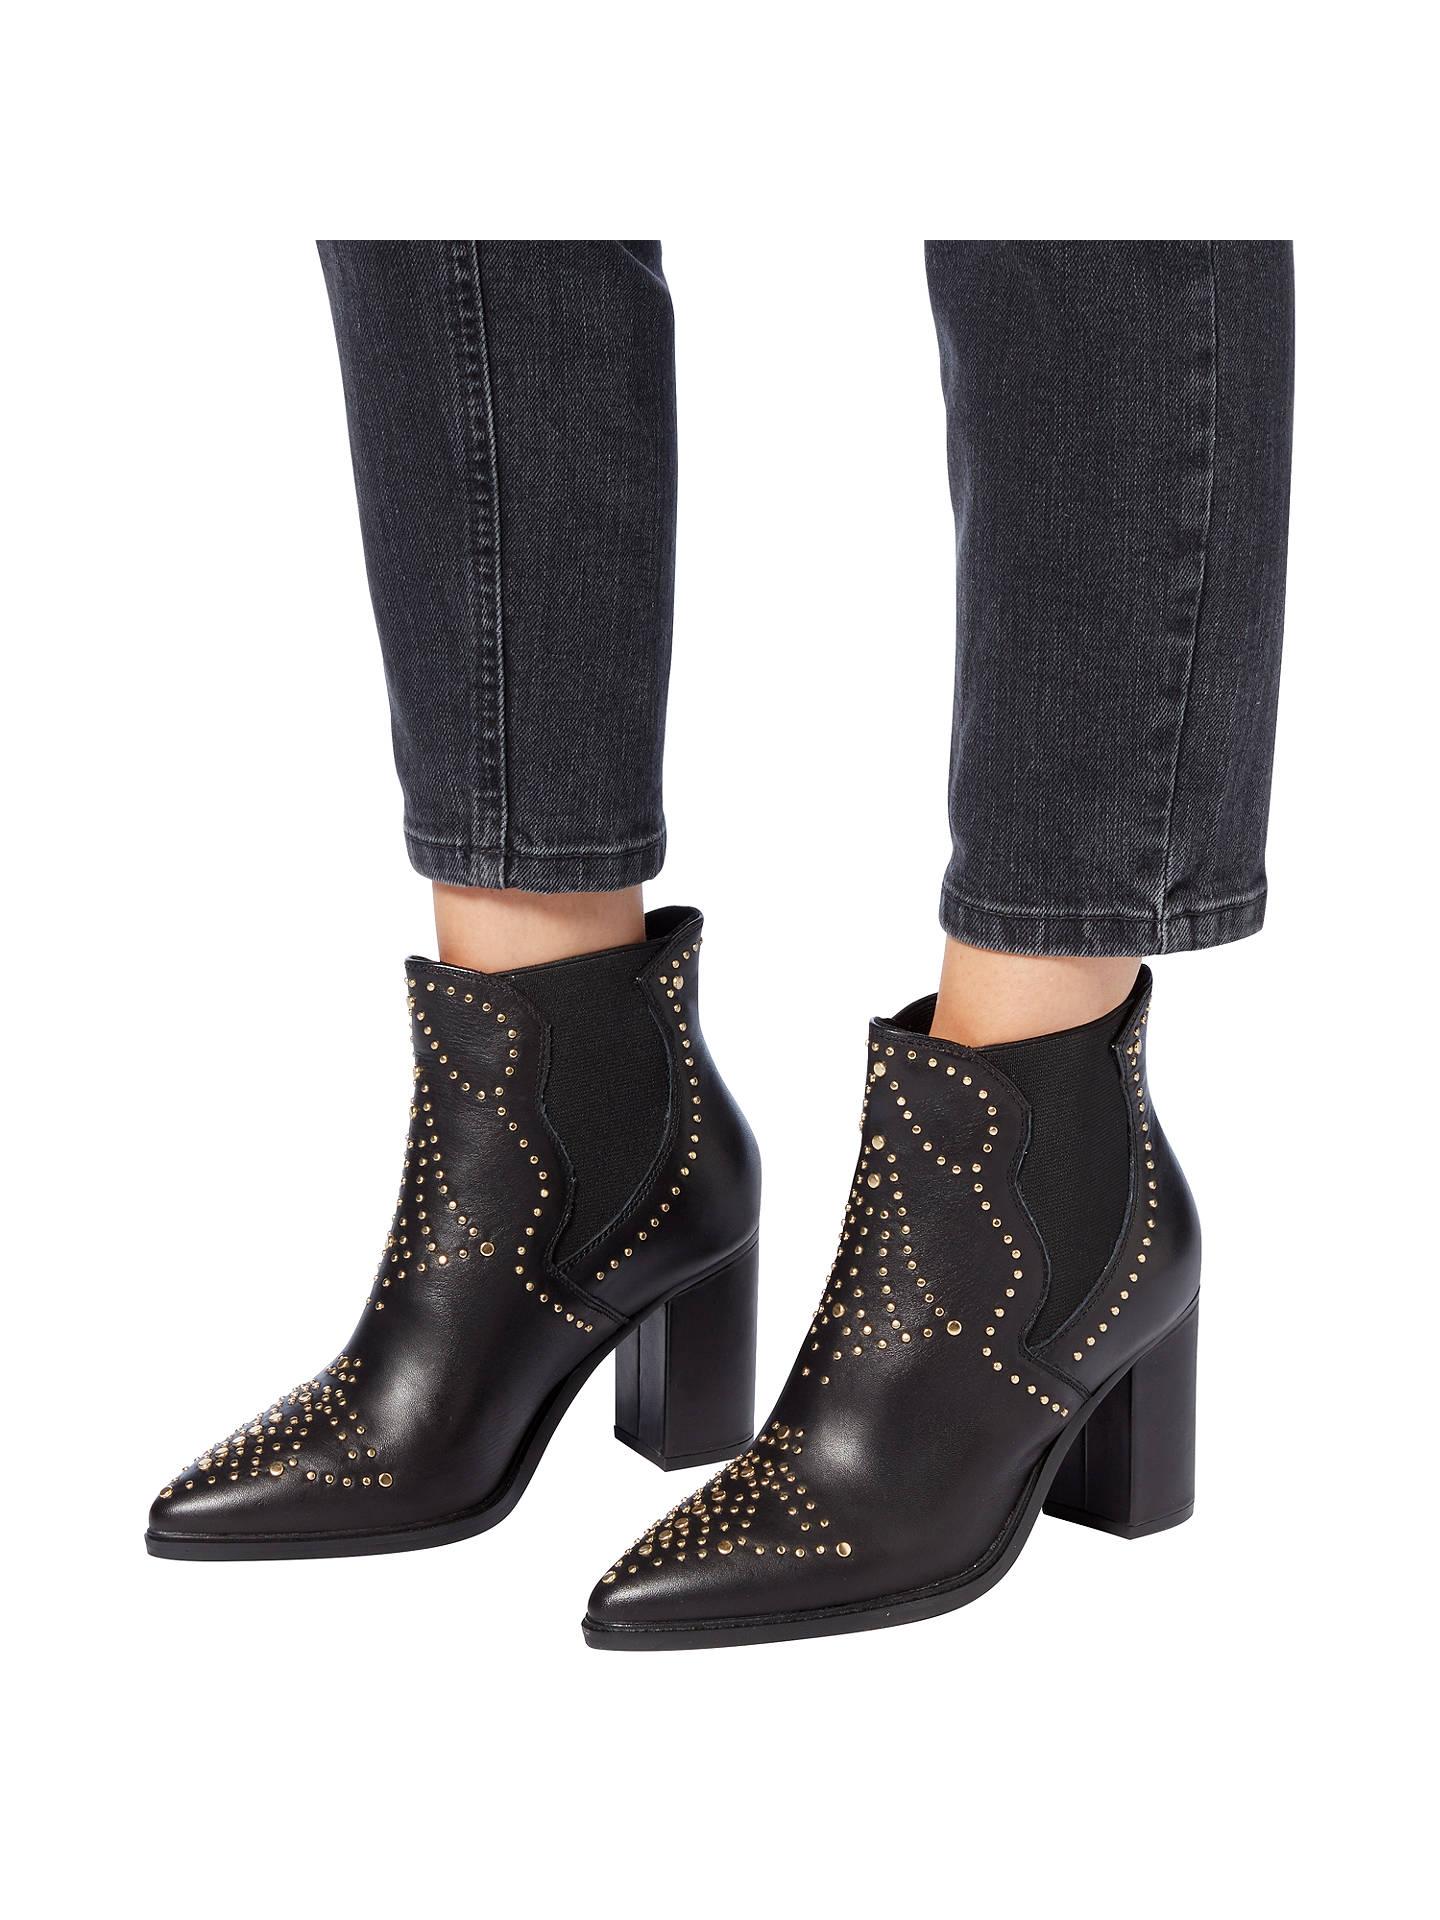 steve madden studded ankle boots uk